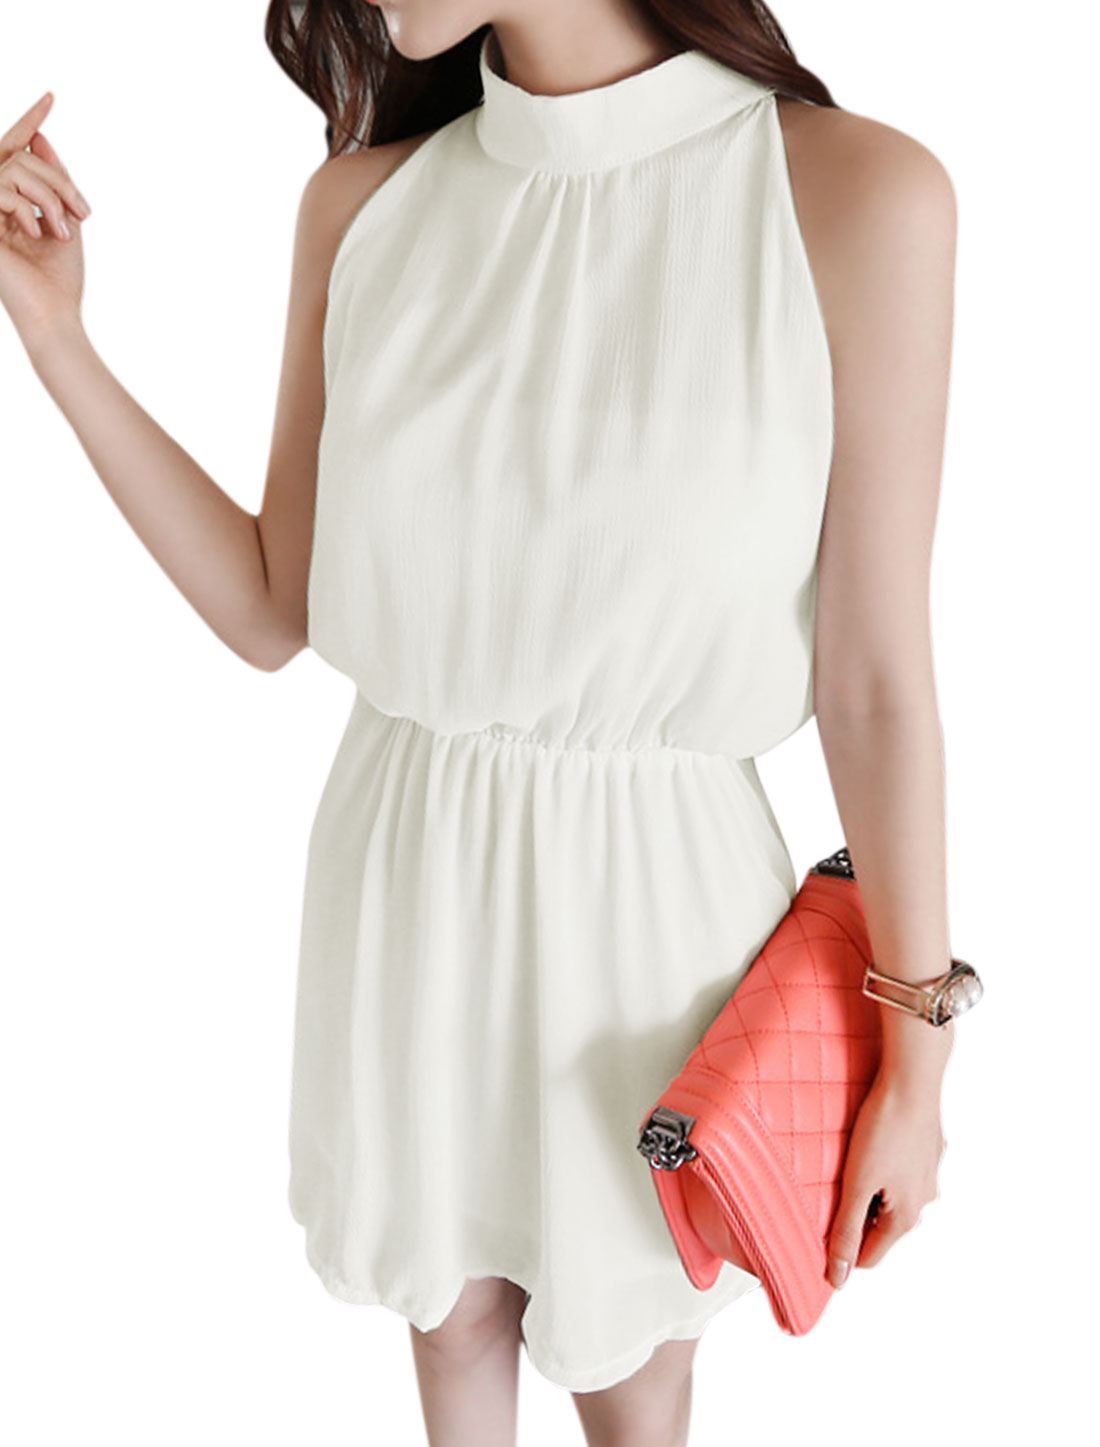 Women Halter Neck Stand Collar Sleeveless Elastic Waist Chiffon Dress White M